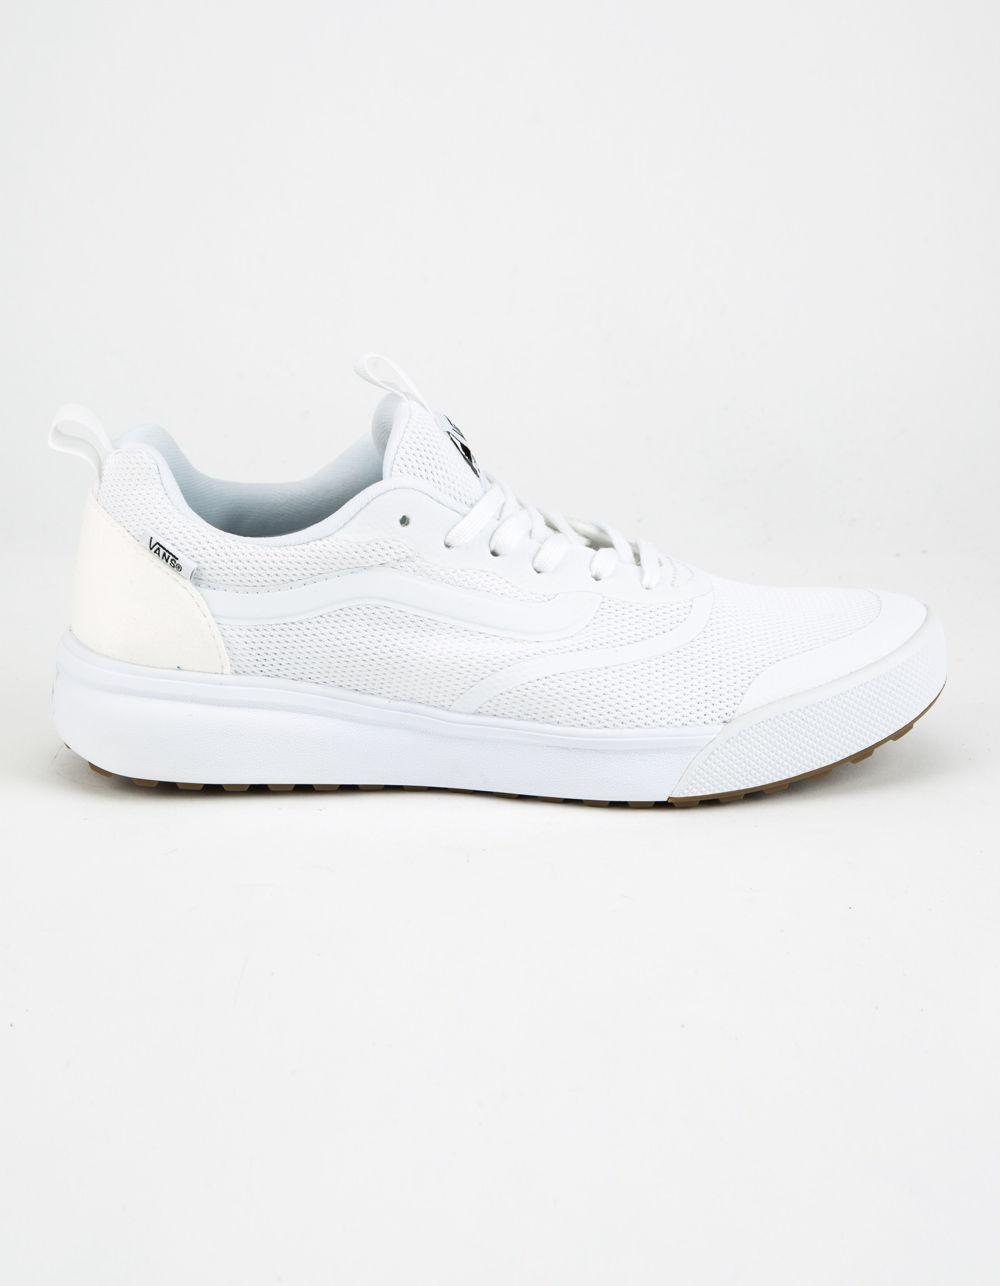 c16839e077 Lyst - Vans Ultrarange Rapidweld Mens Shoes in White for Men